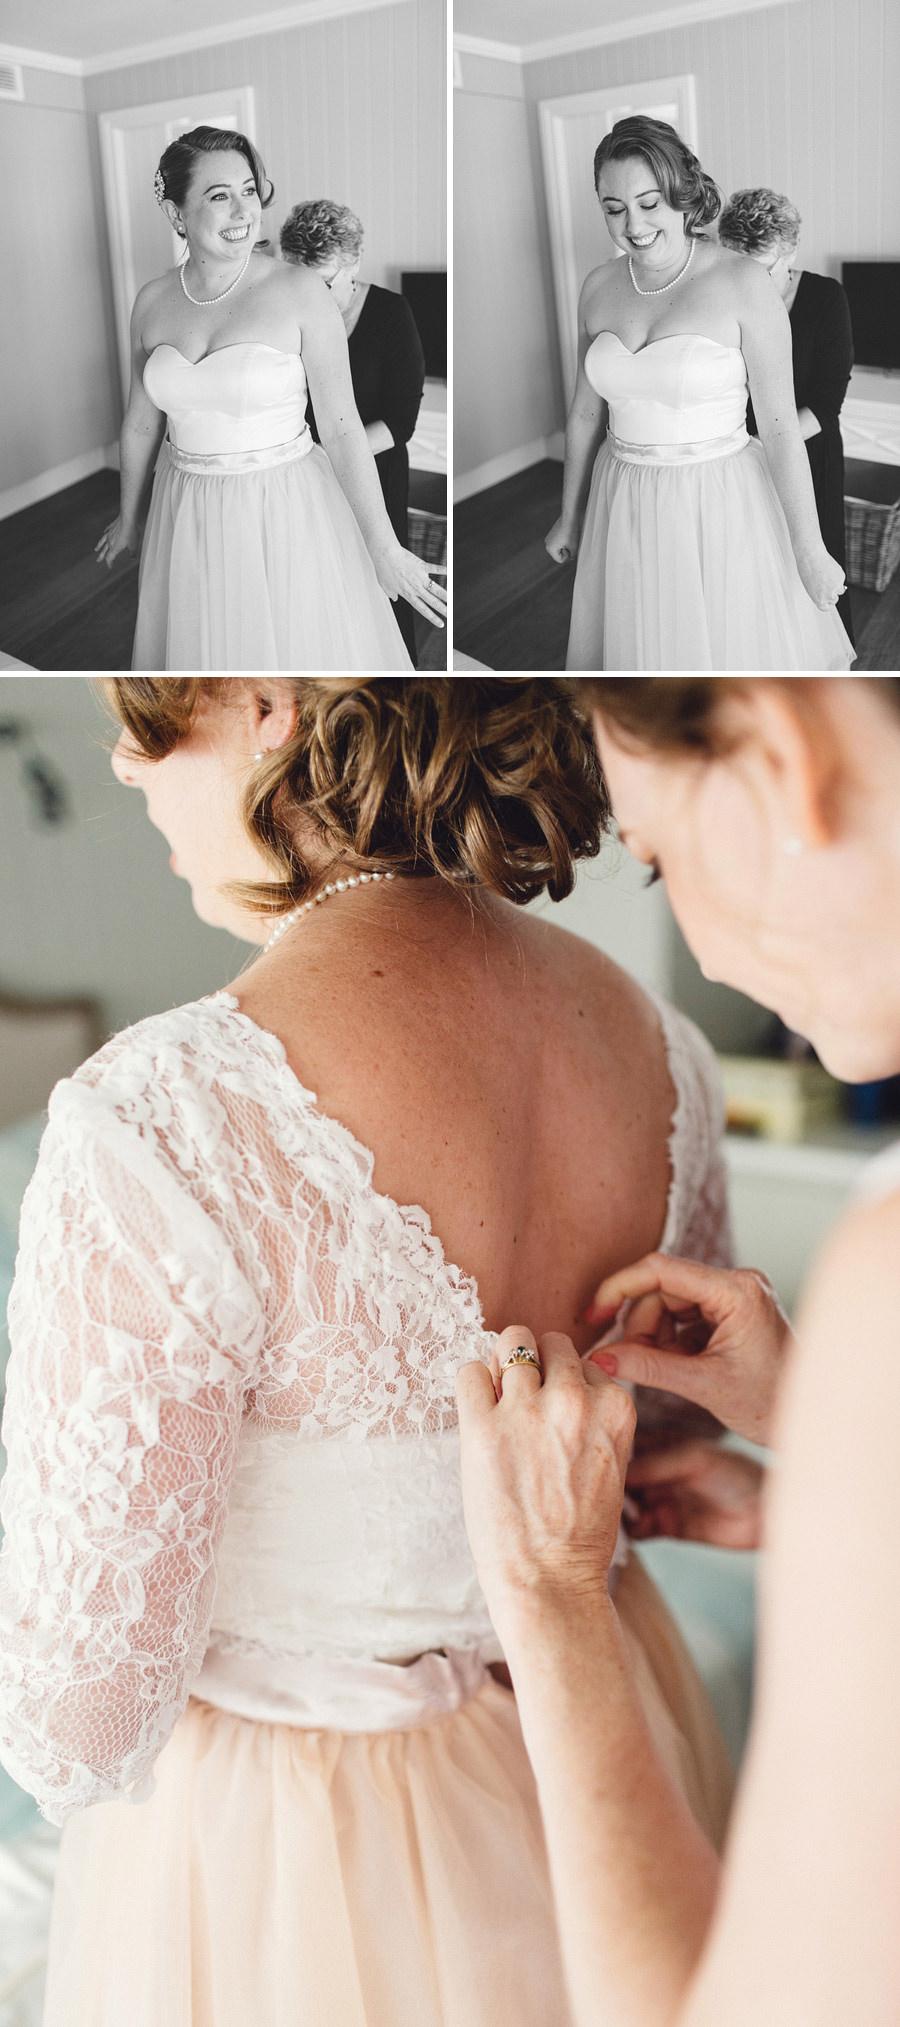 Candid Wedding Photography: Bride getting ready